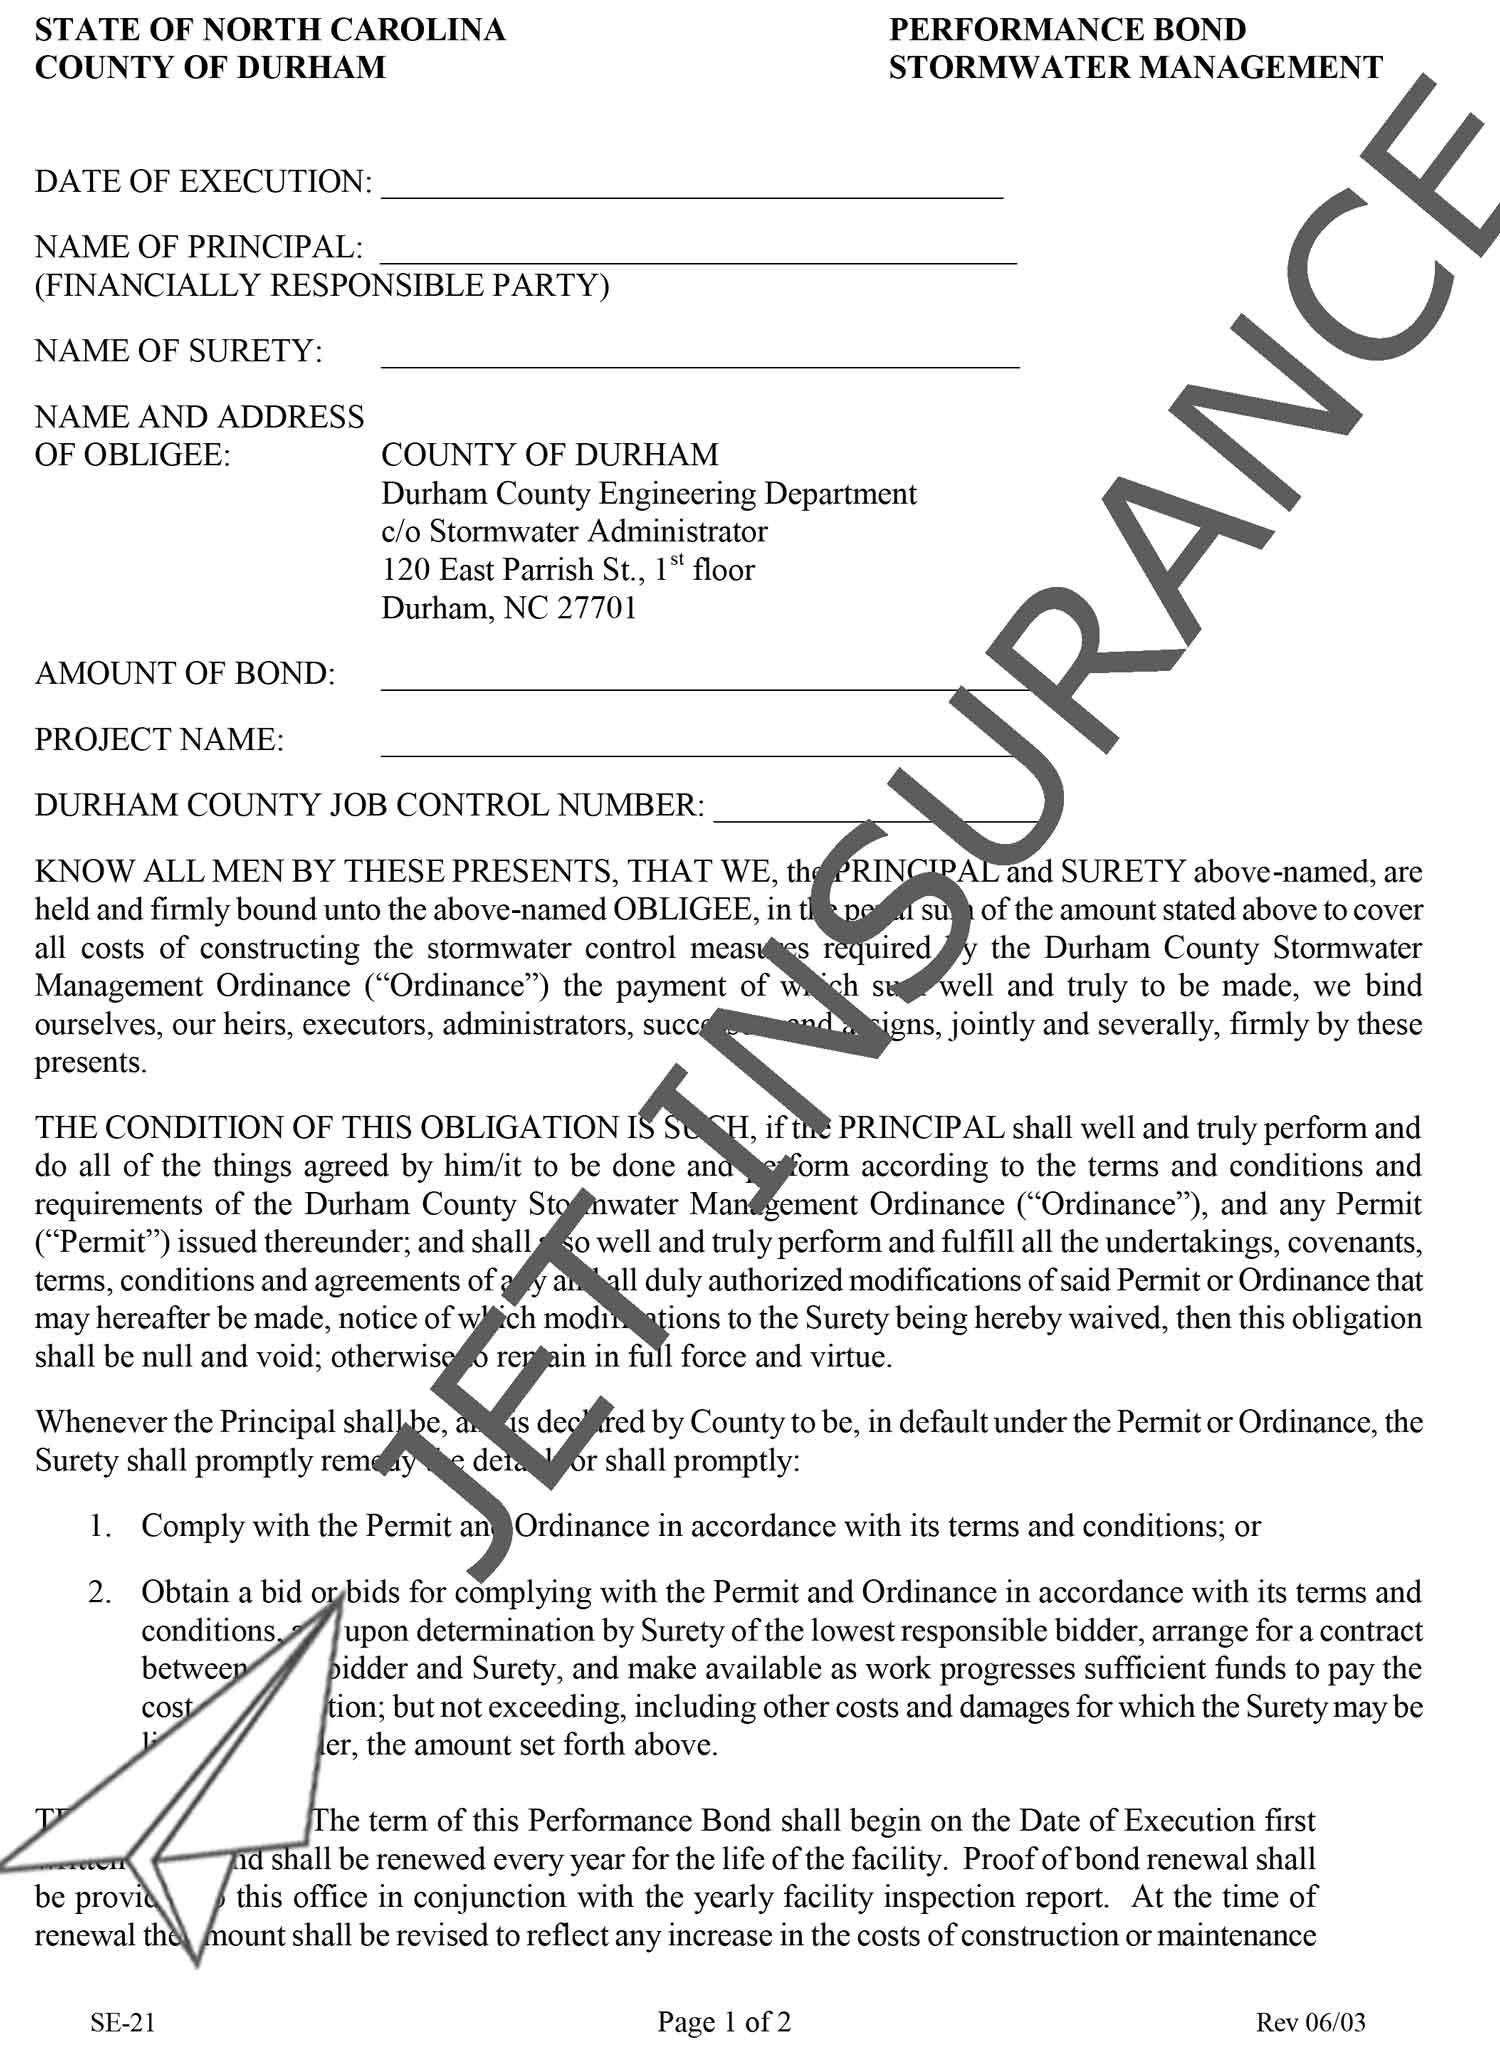 Durham County North Carolina Stormwater Management Bond Form